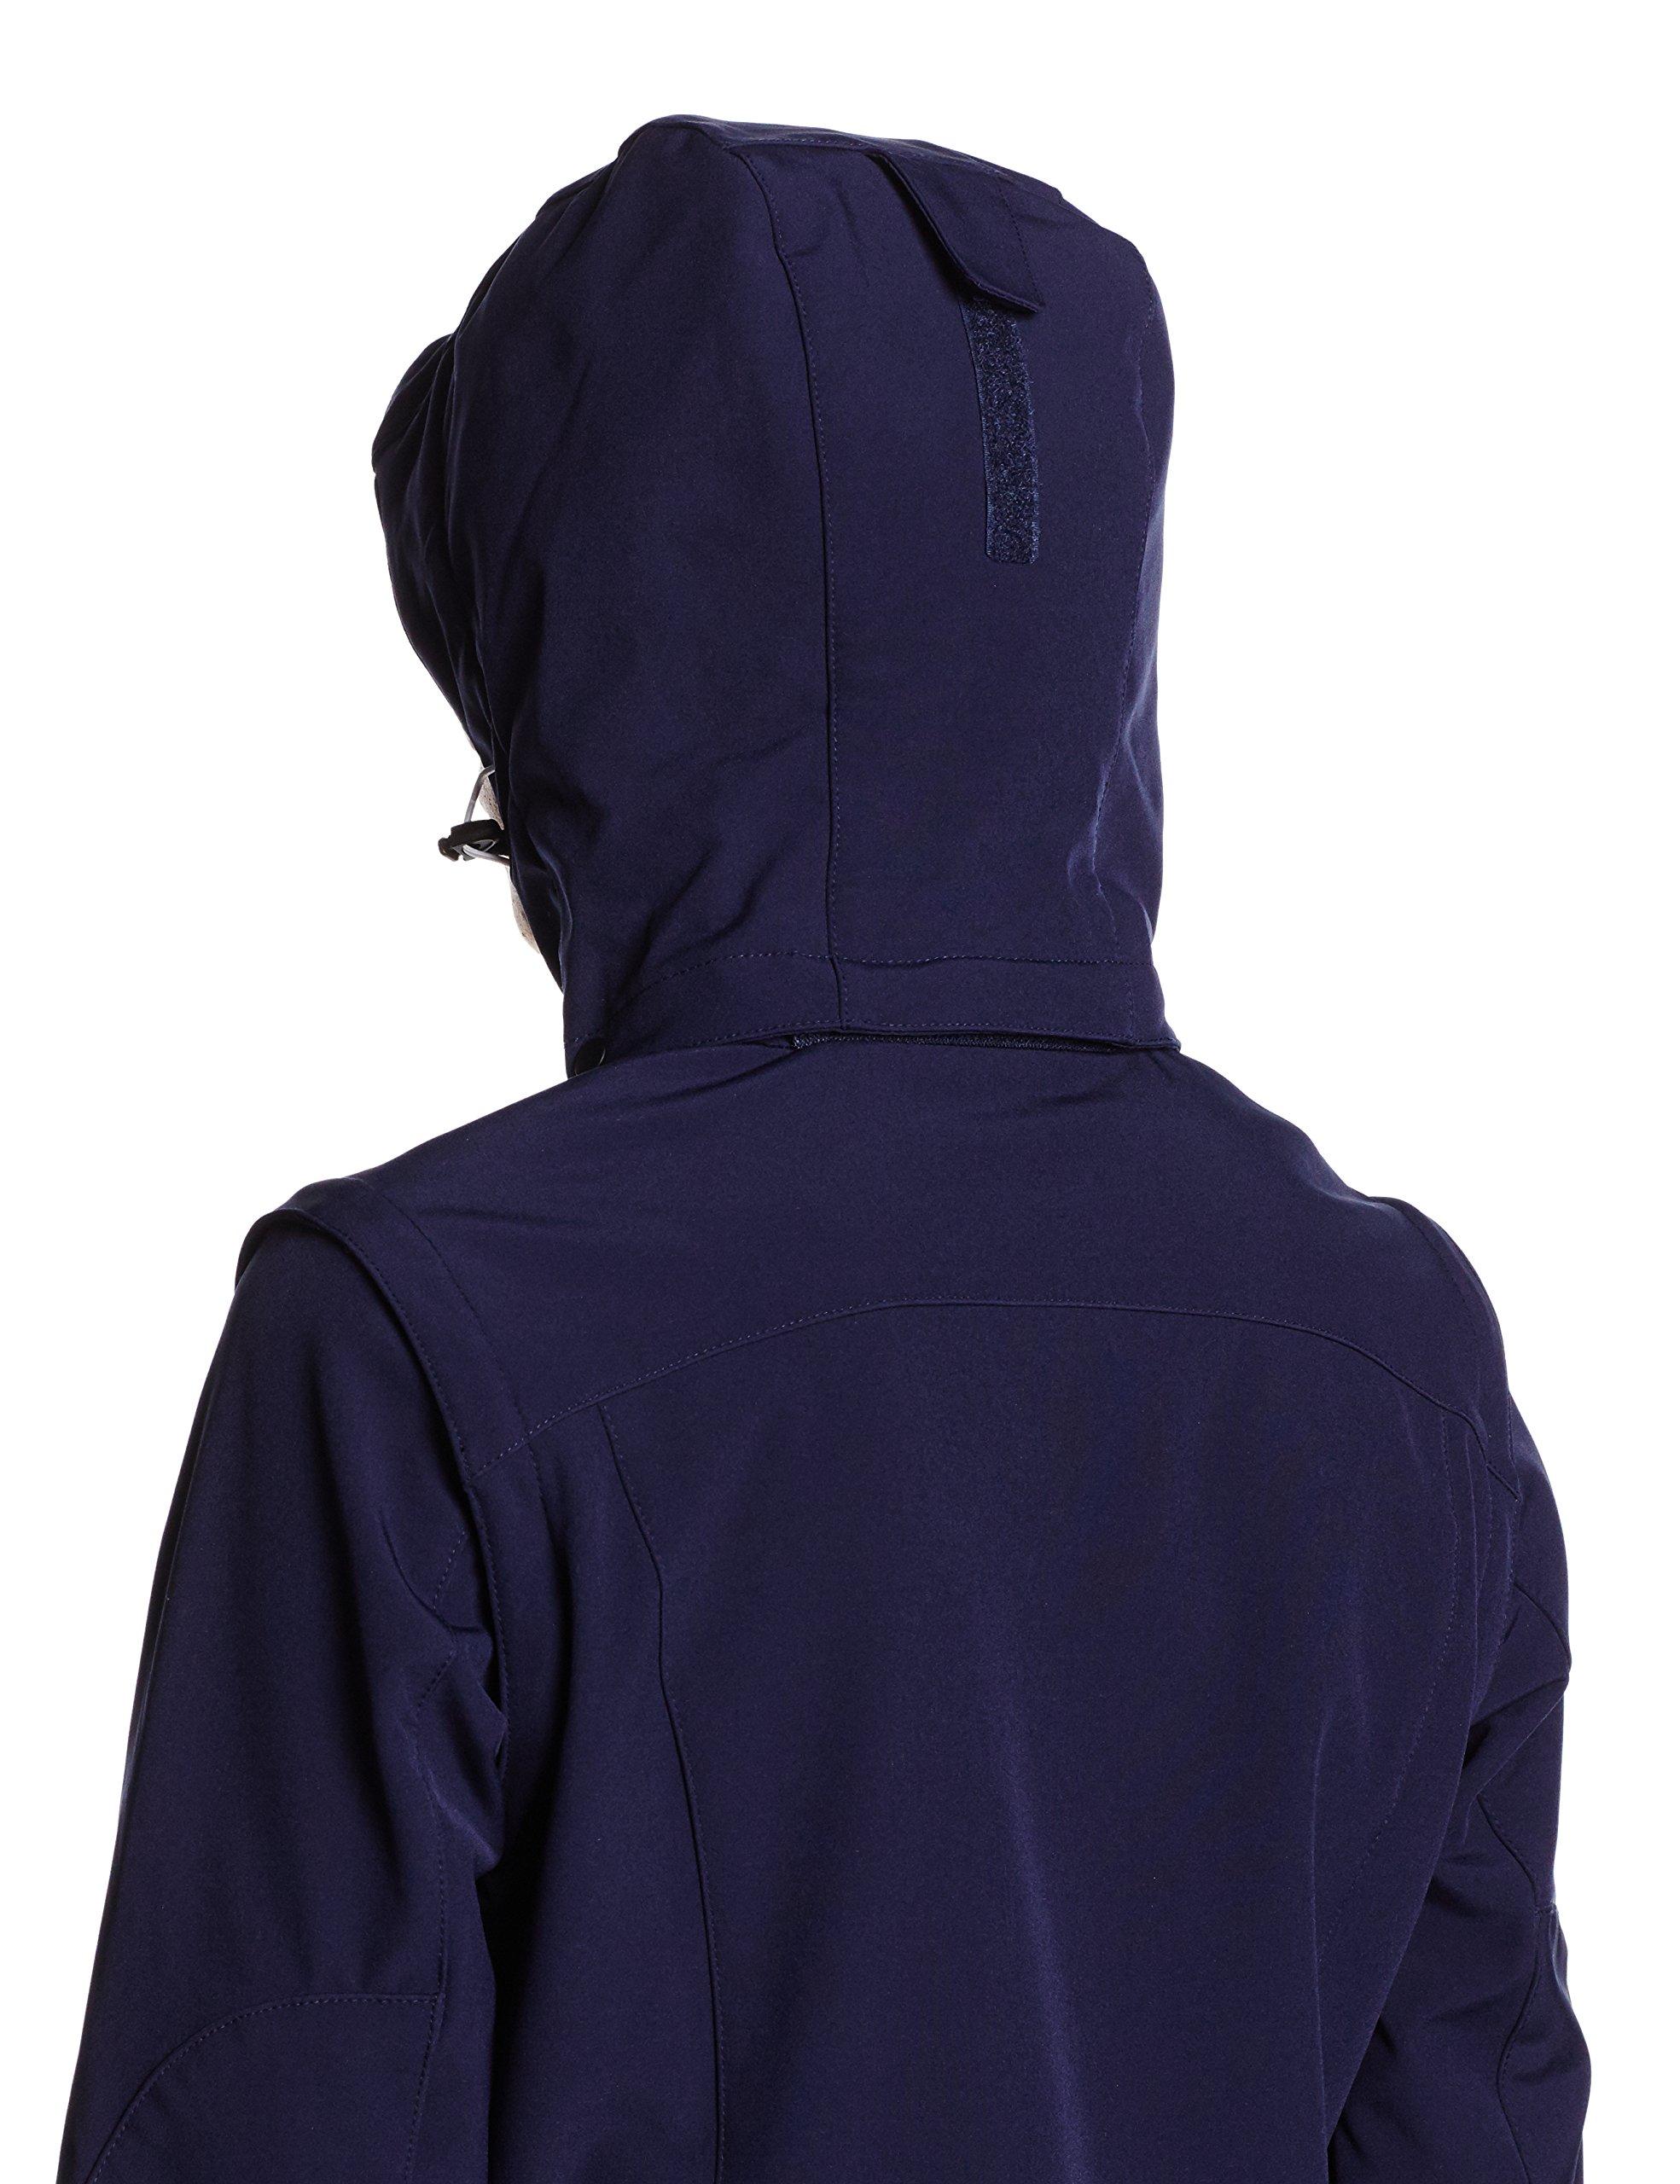 81e1DrGycGL - ICEPEAK Leonie Women's Soft Shell Jacket,